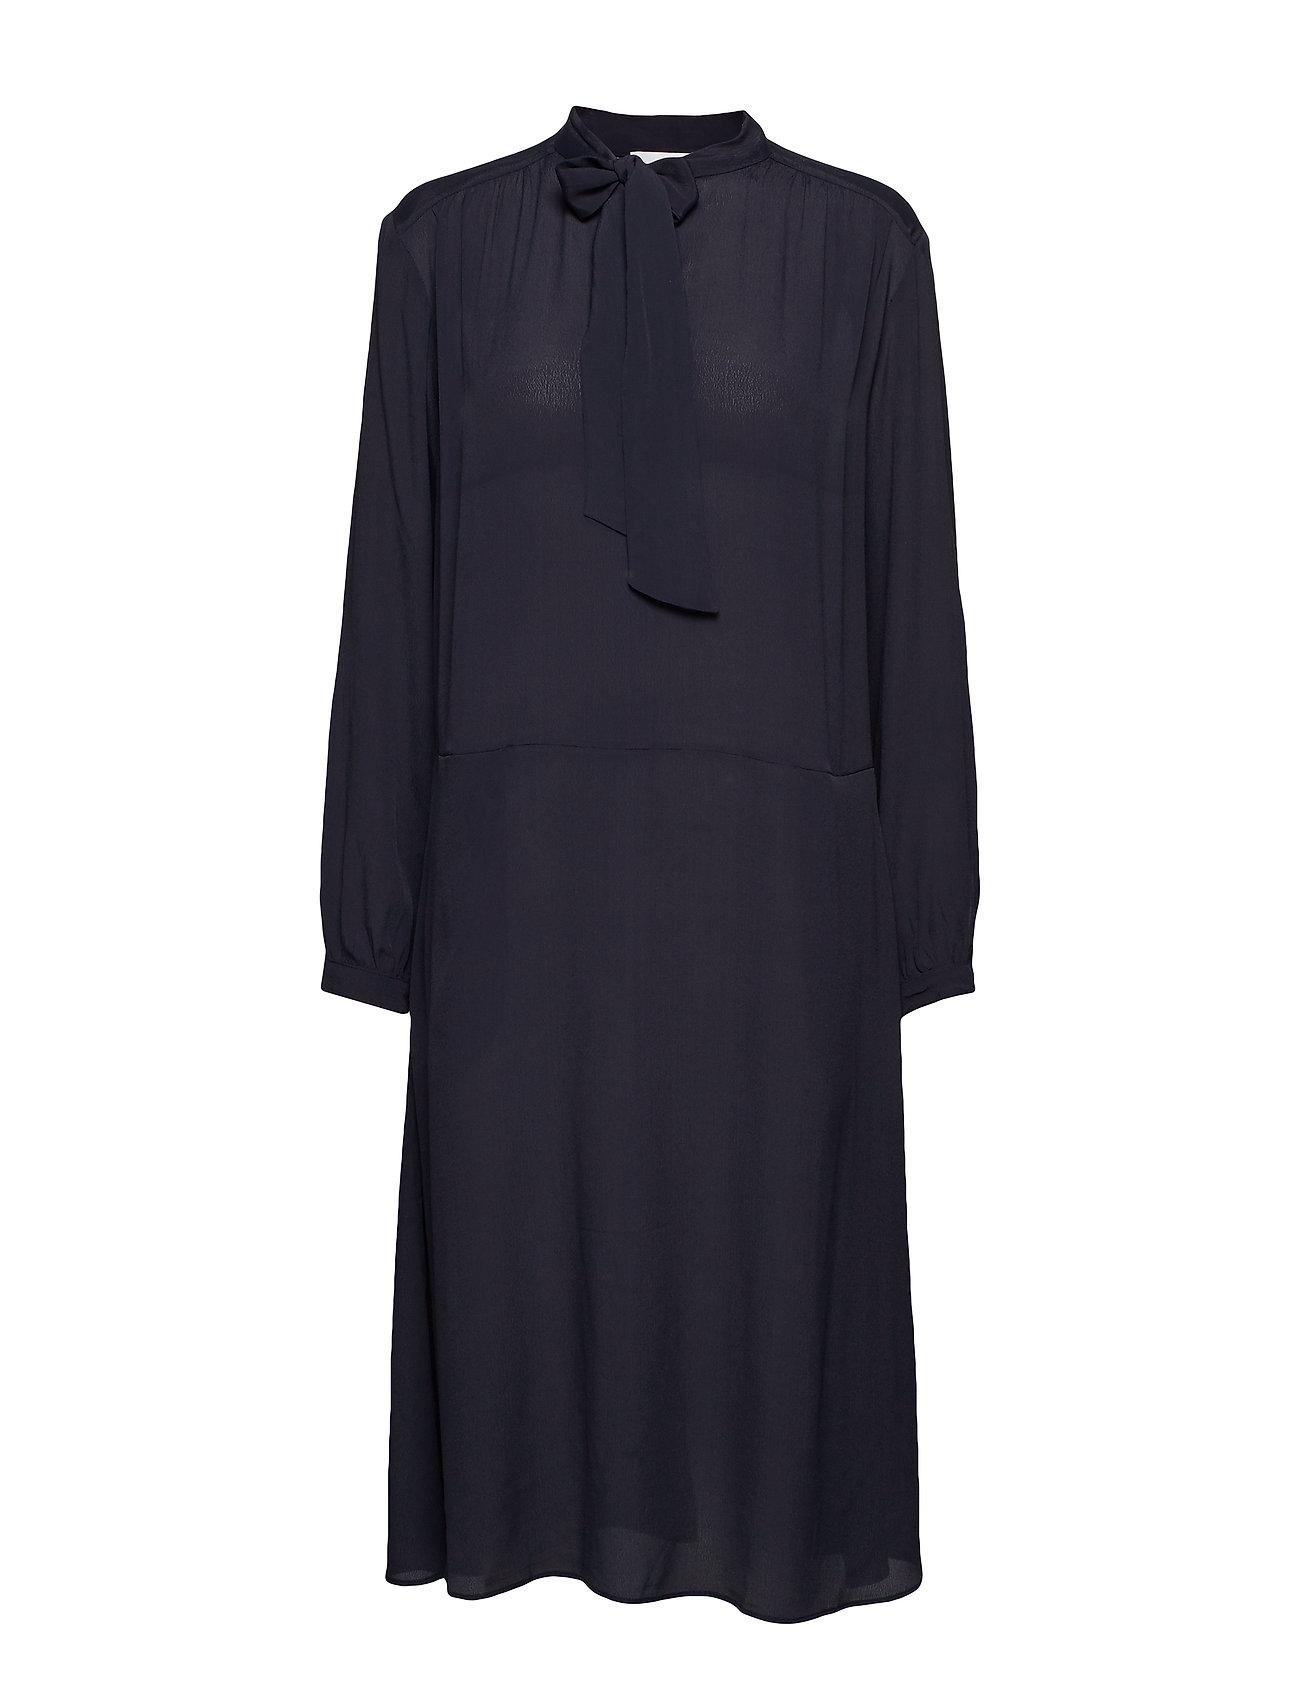 Samsøe & Samsøe Merrit dress 10867 - NIGHT SKY